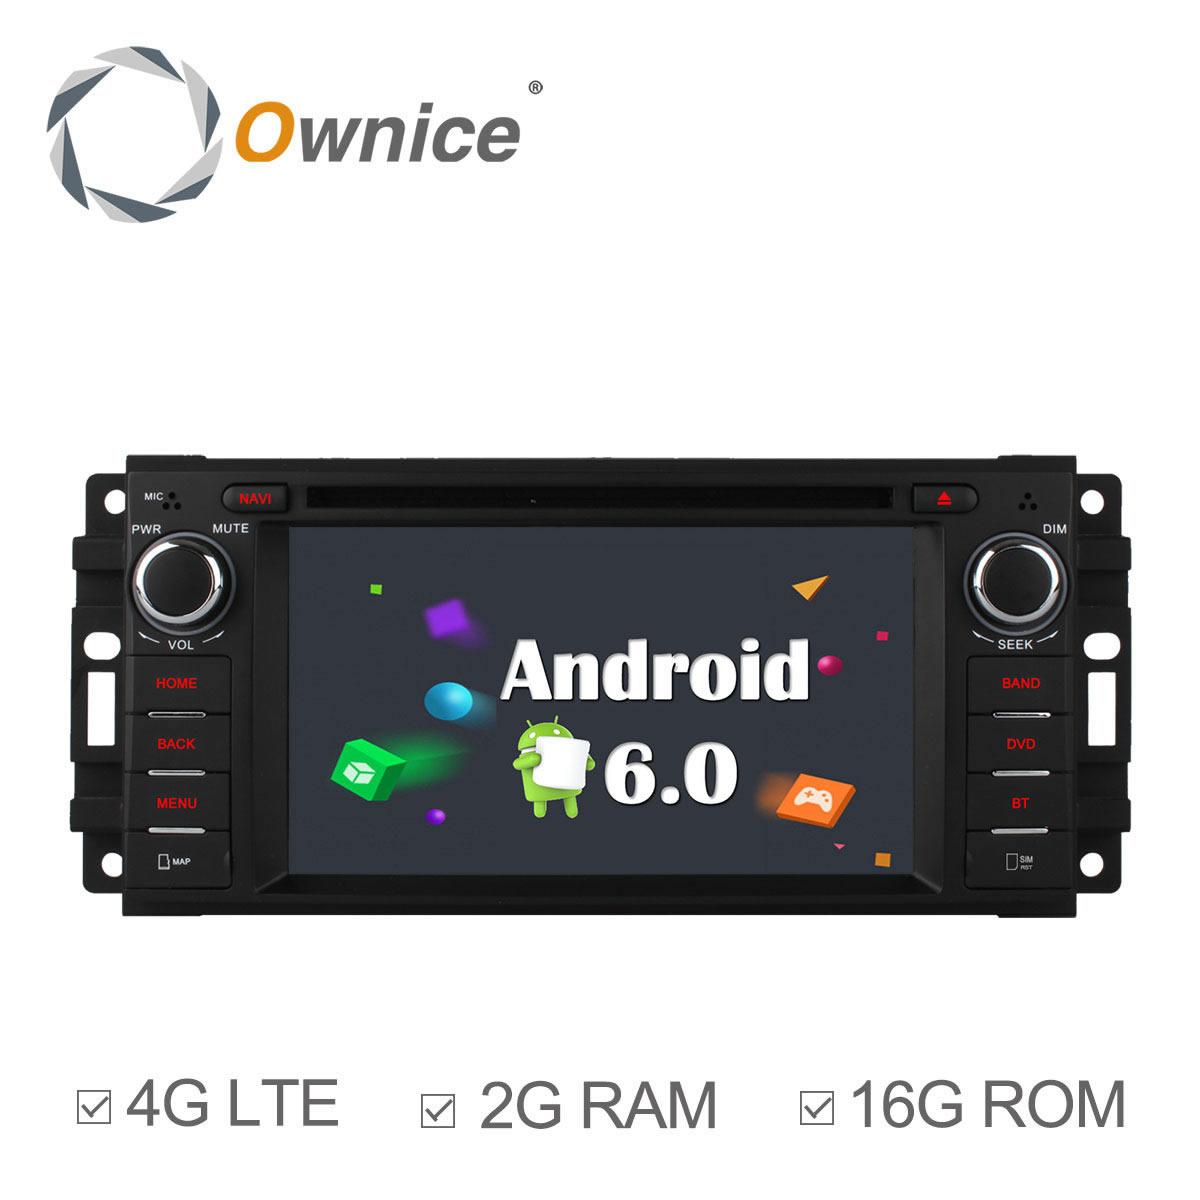 Ownice 2G RAM Android 6.0 Quad Core Car Radio DVD Player GPS for CHRYSLER 300C PT CRUISER DODGE RAM JEEP GRAND CHEROKEE BT Radio(China (Mainland))